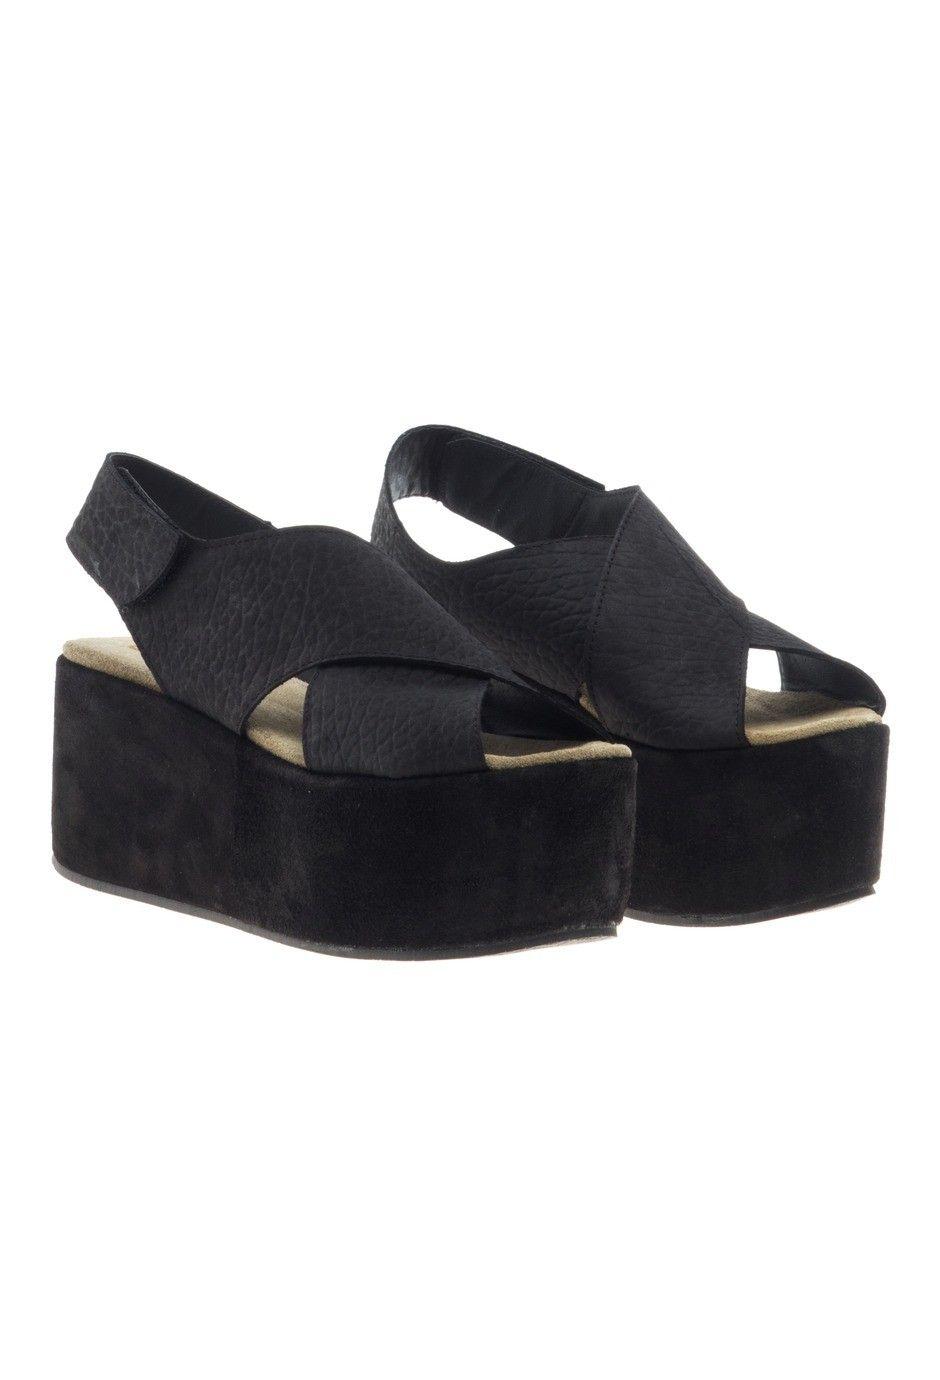 Belt Marlene ShoesWedges NegroShoes Y Viamo Sandalias bI6fyvY7g